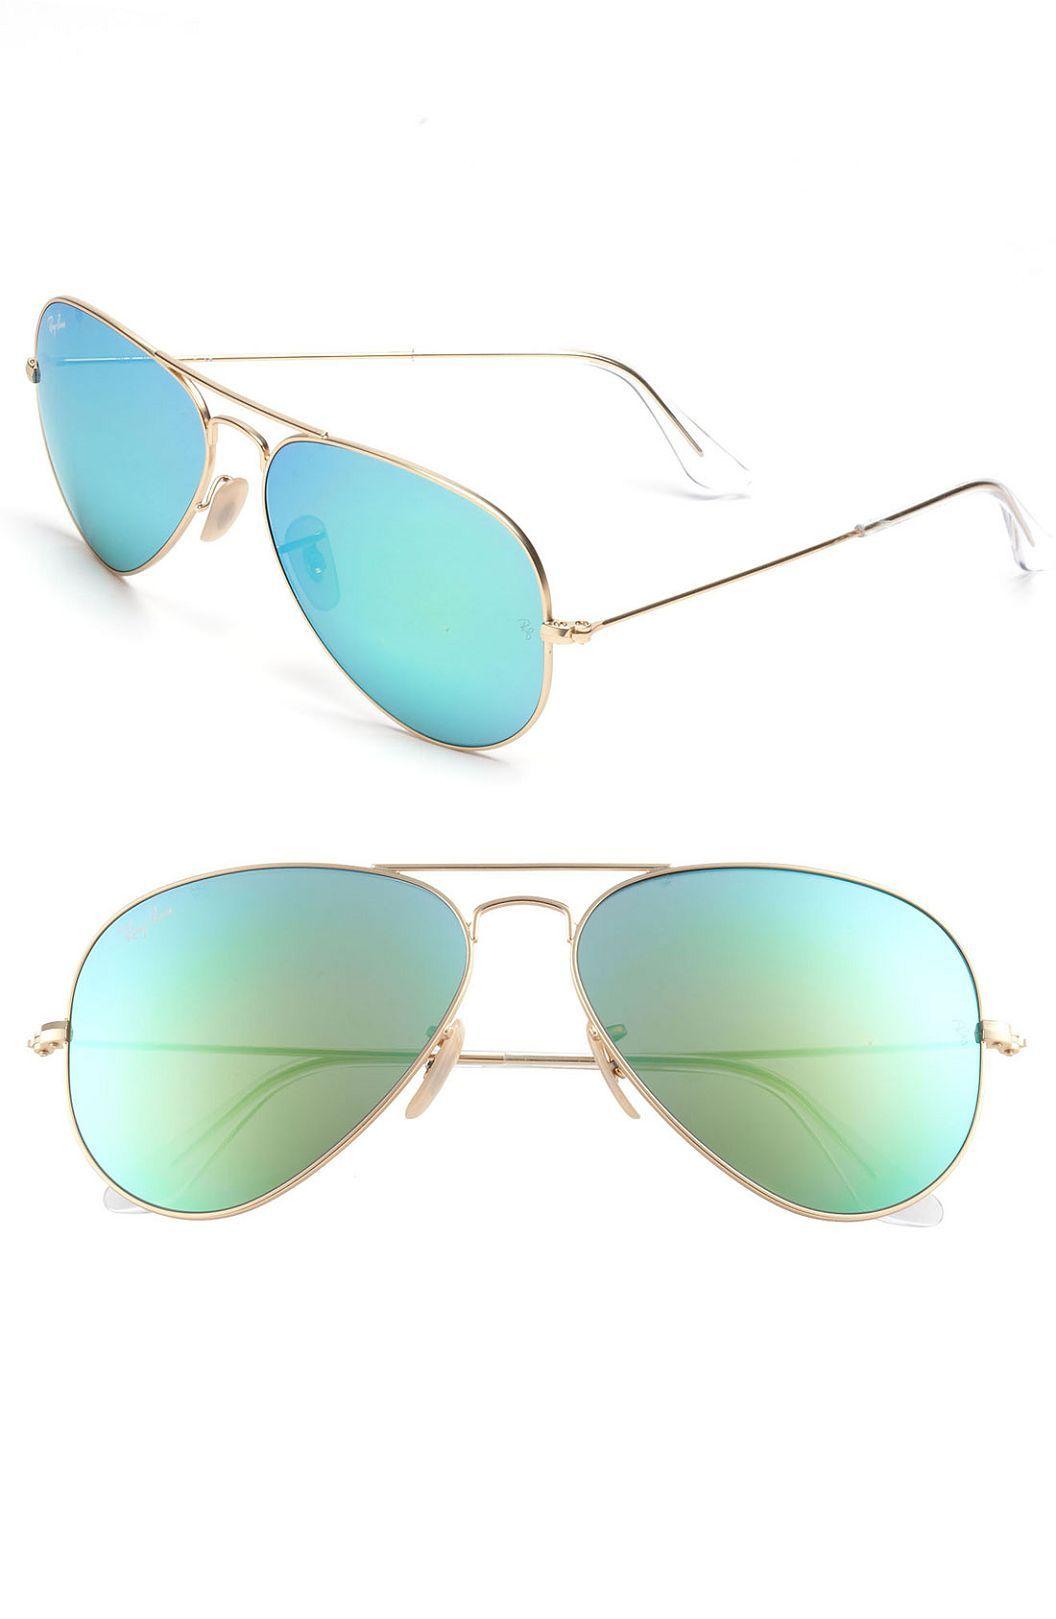 RB Sunglasses on   Ray Ban Wayfarer   Oculos de sol, Óculos, Óculos ... 0b7611ff94